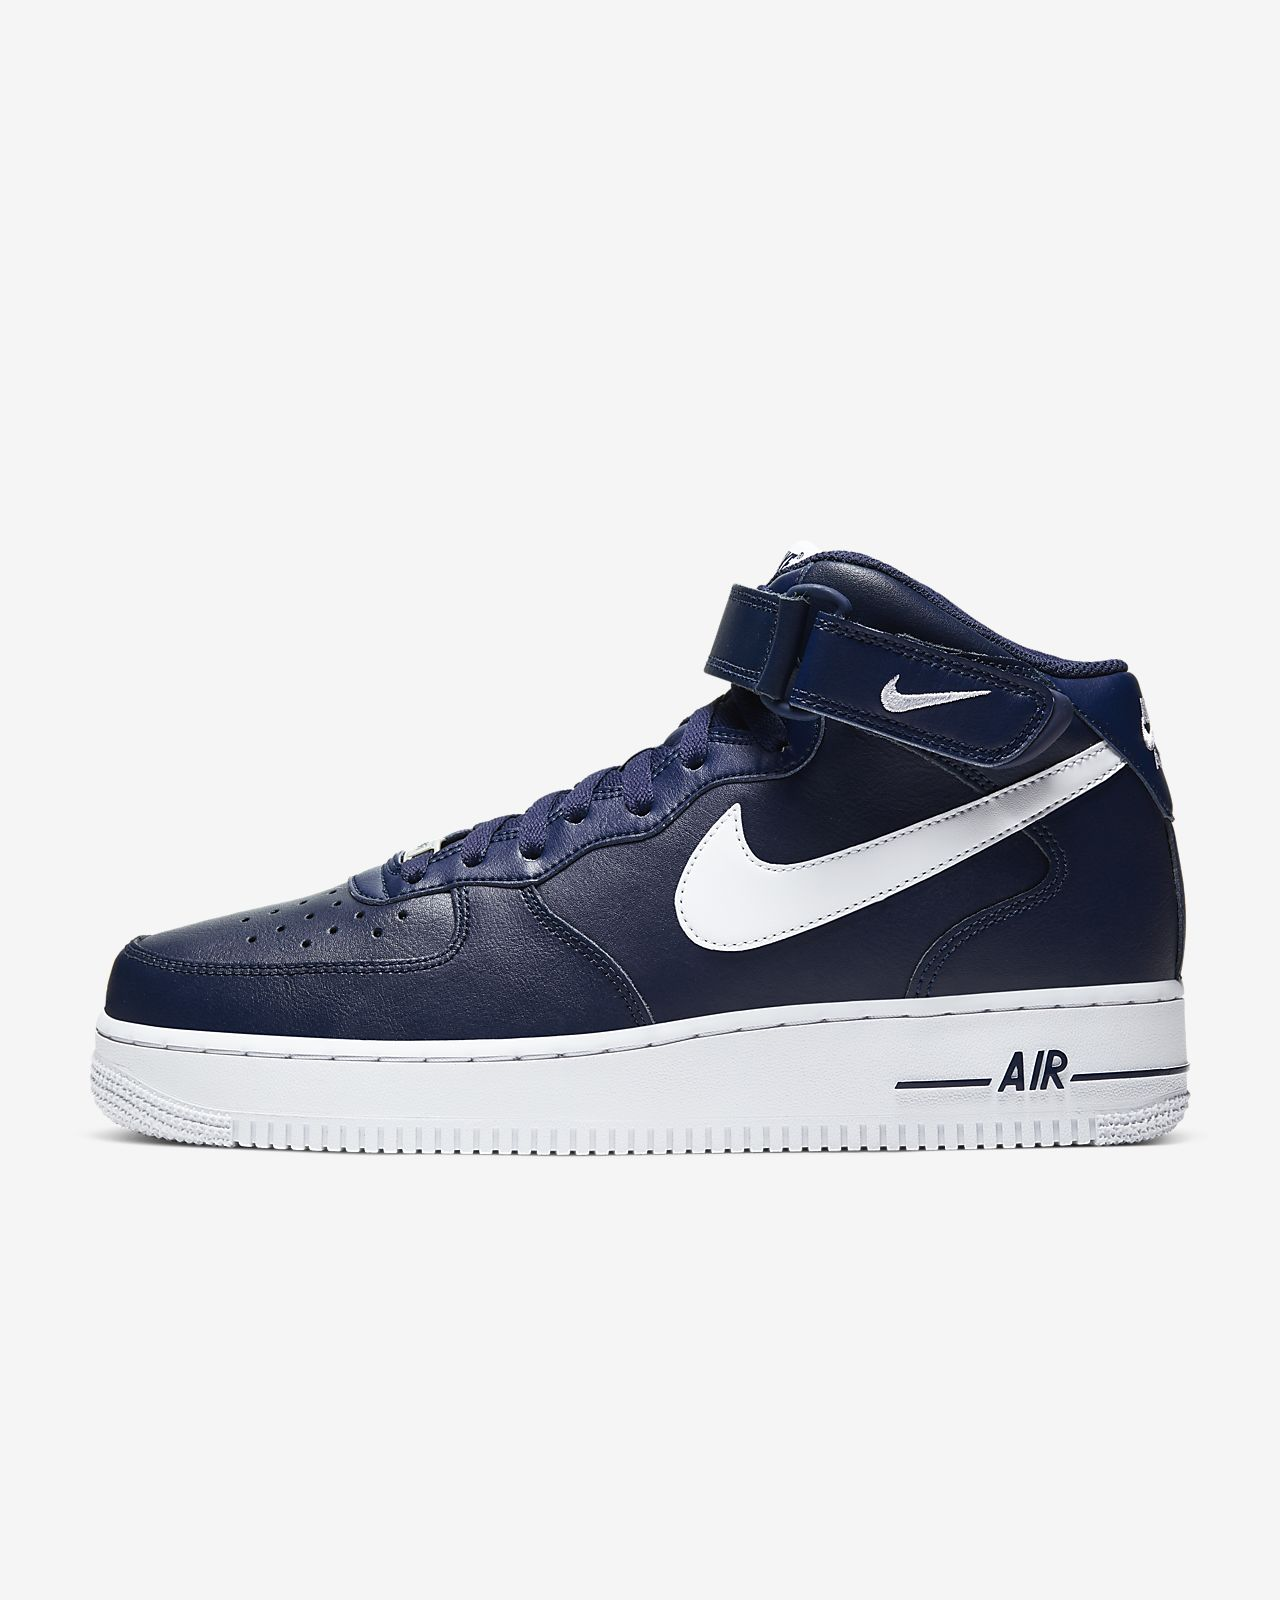 Nike Air Force 1 Mid '07 Lv8 Herren Basketballschuhe Weiß